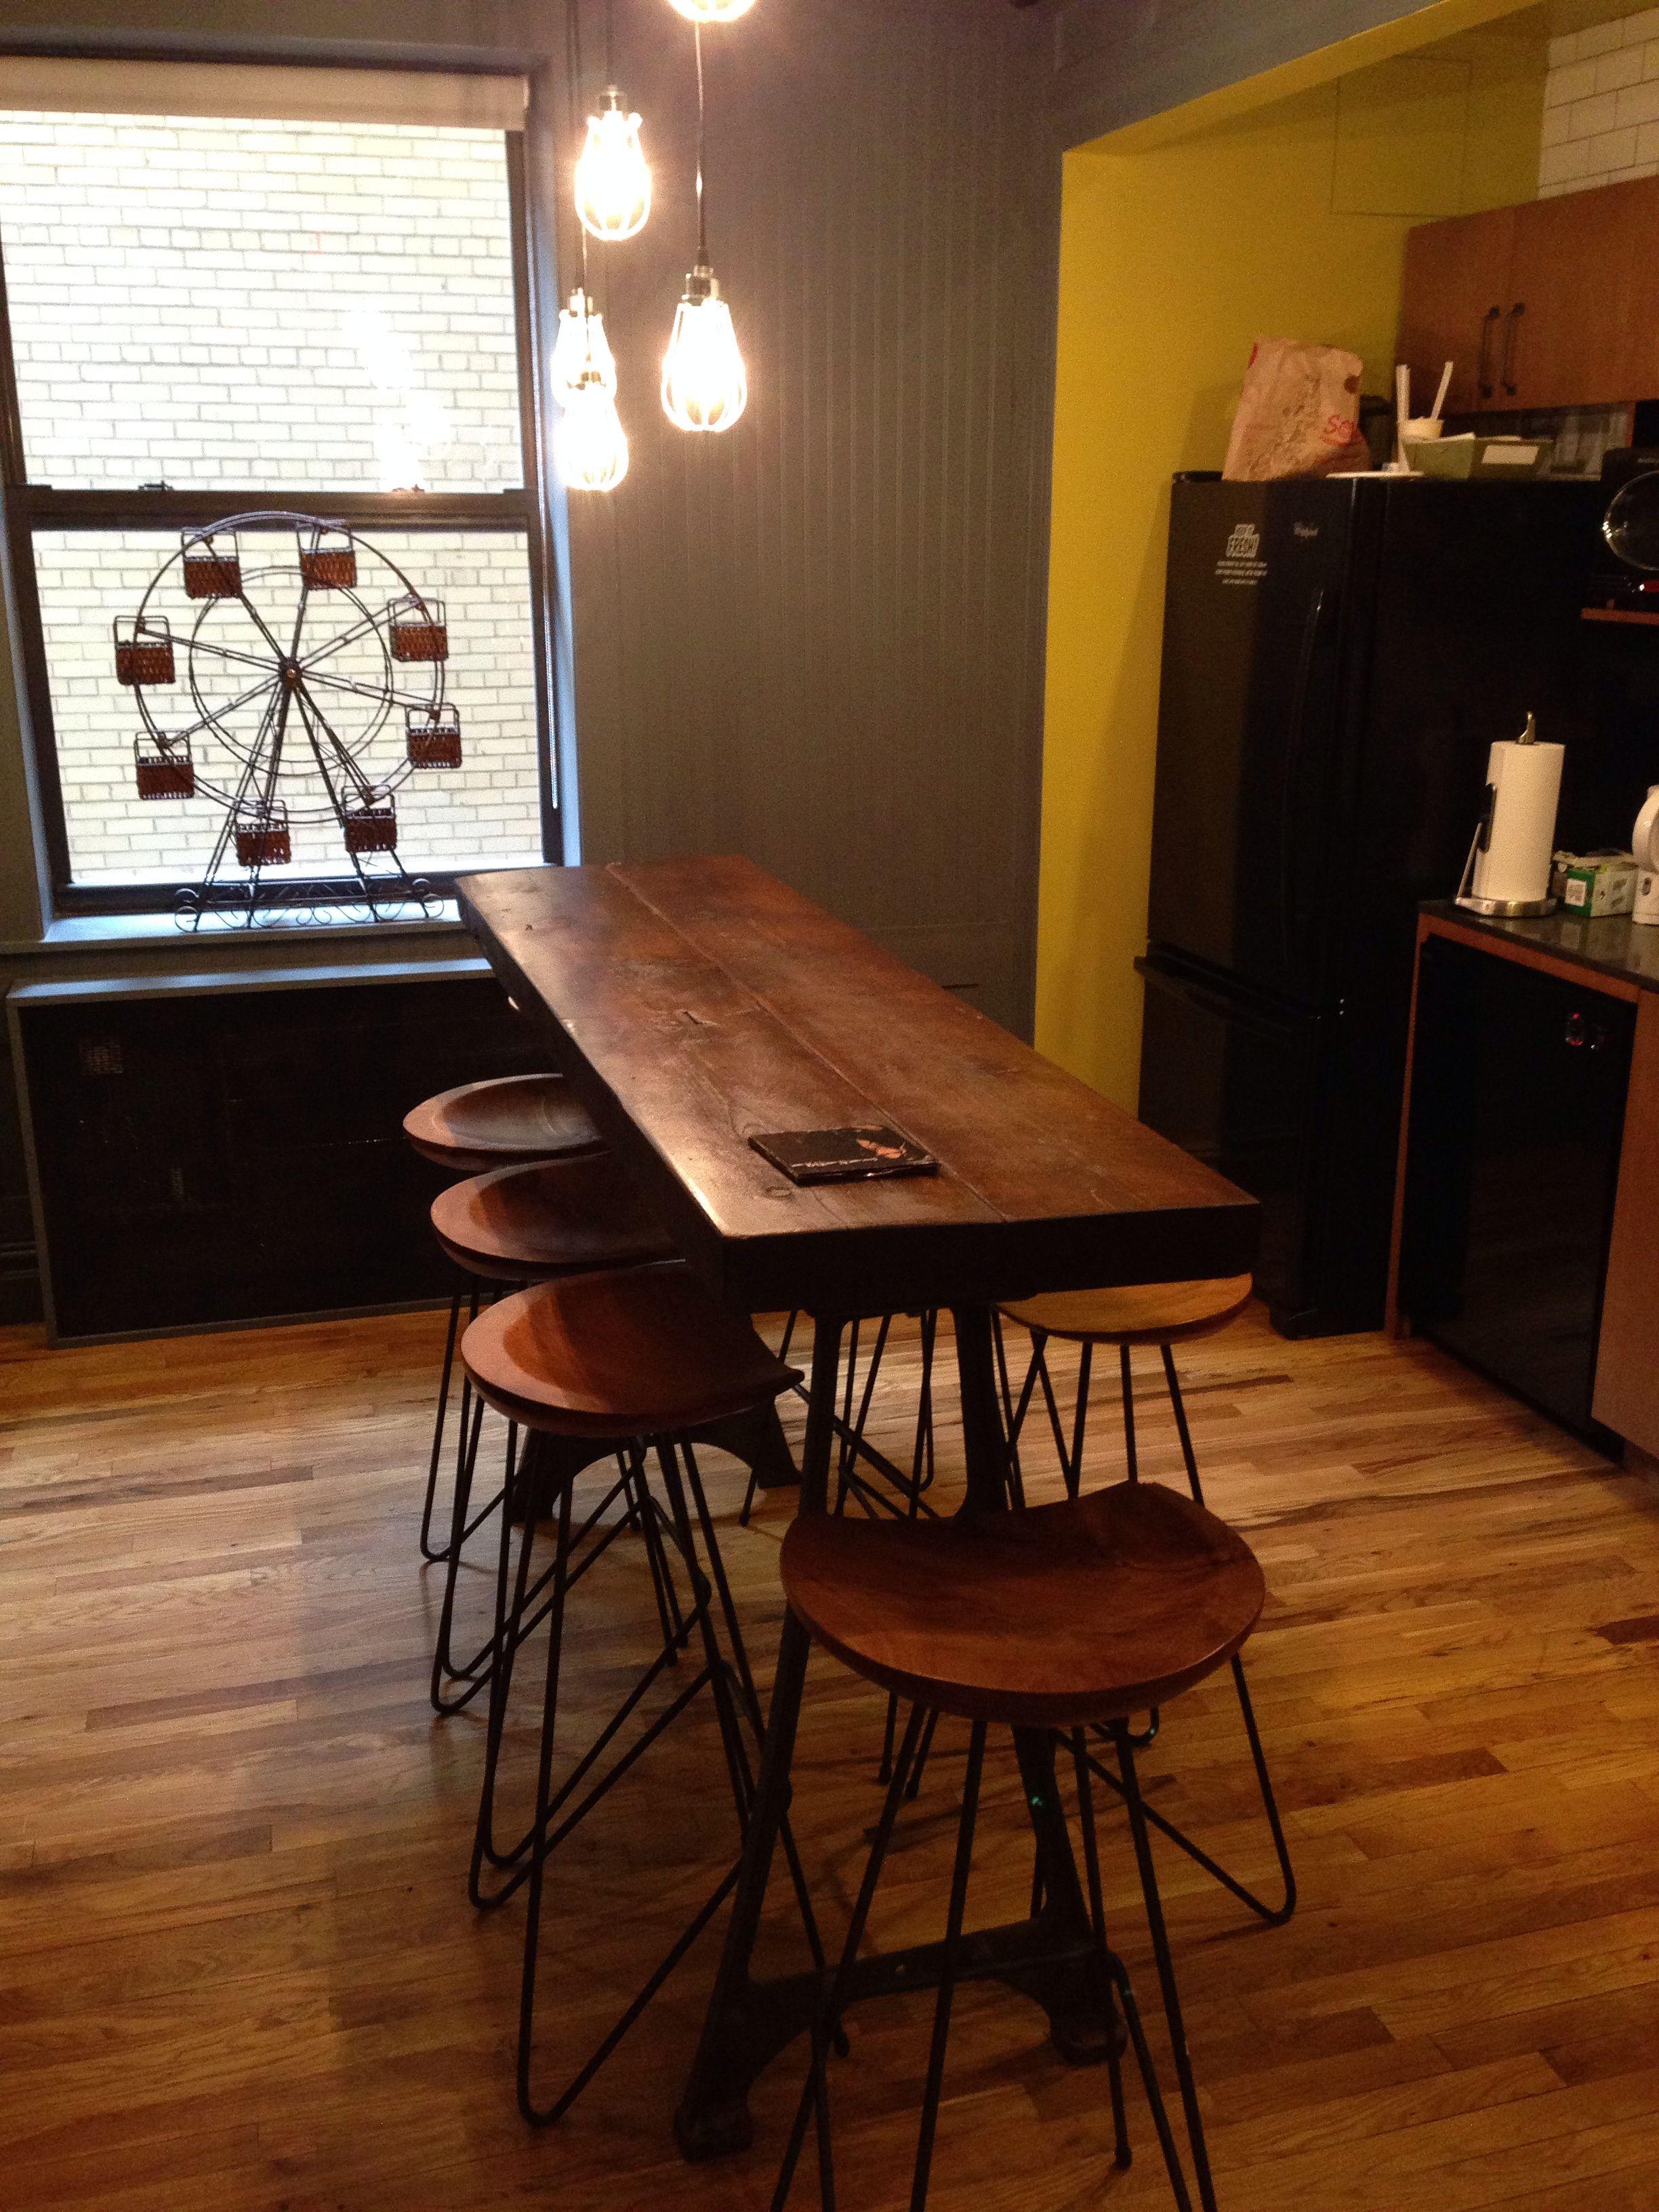 outstanding narrow kitchen island | Narrow kitchen island / breakfast bar | Home Design in ...